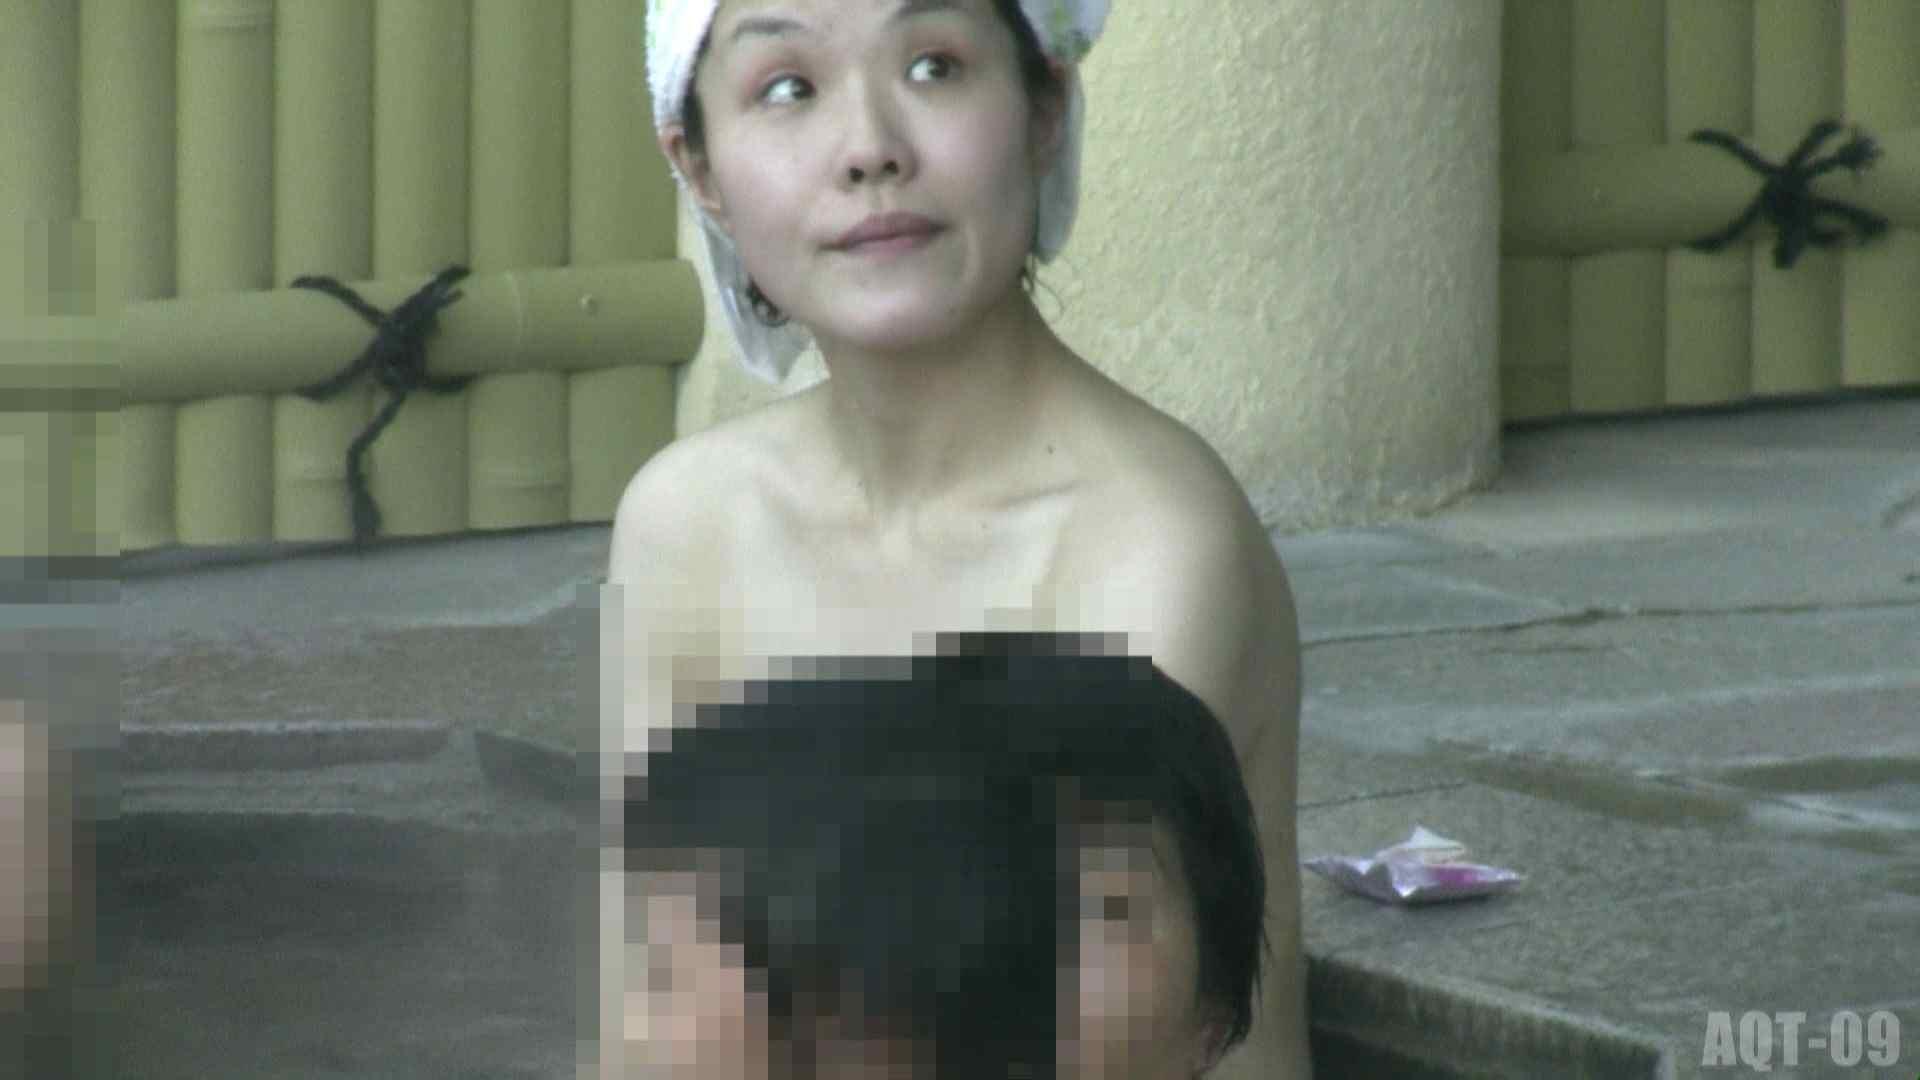 Aquaな露天風呂Vol.786 OLセックス | 盗撮  74画像 1